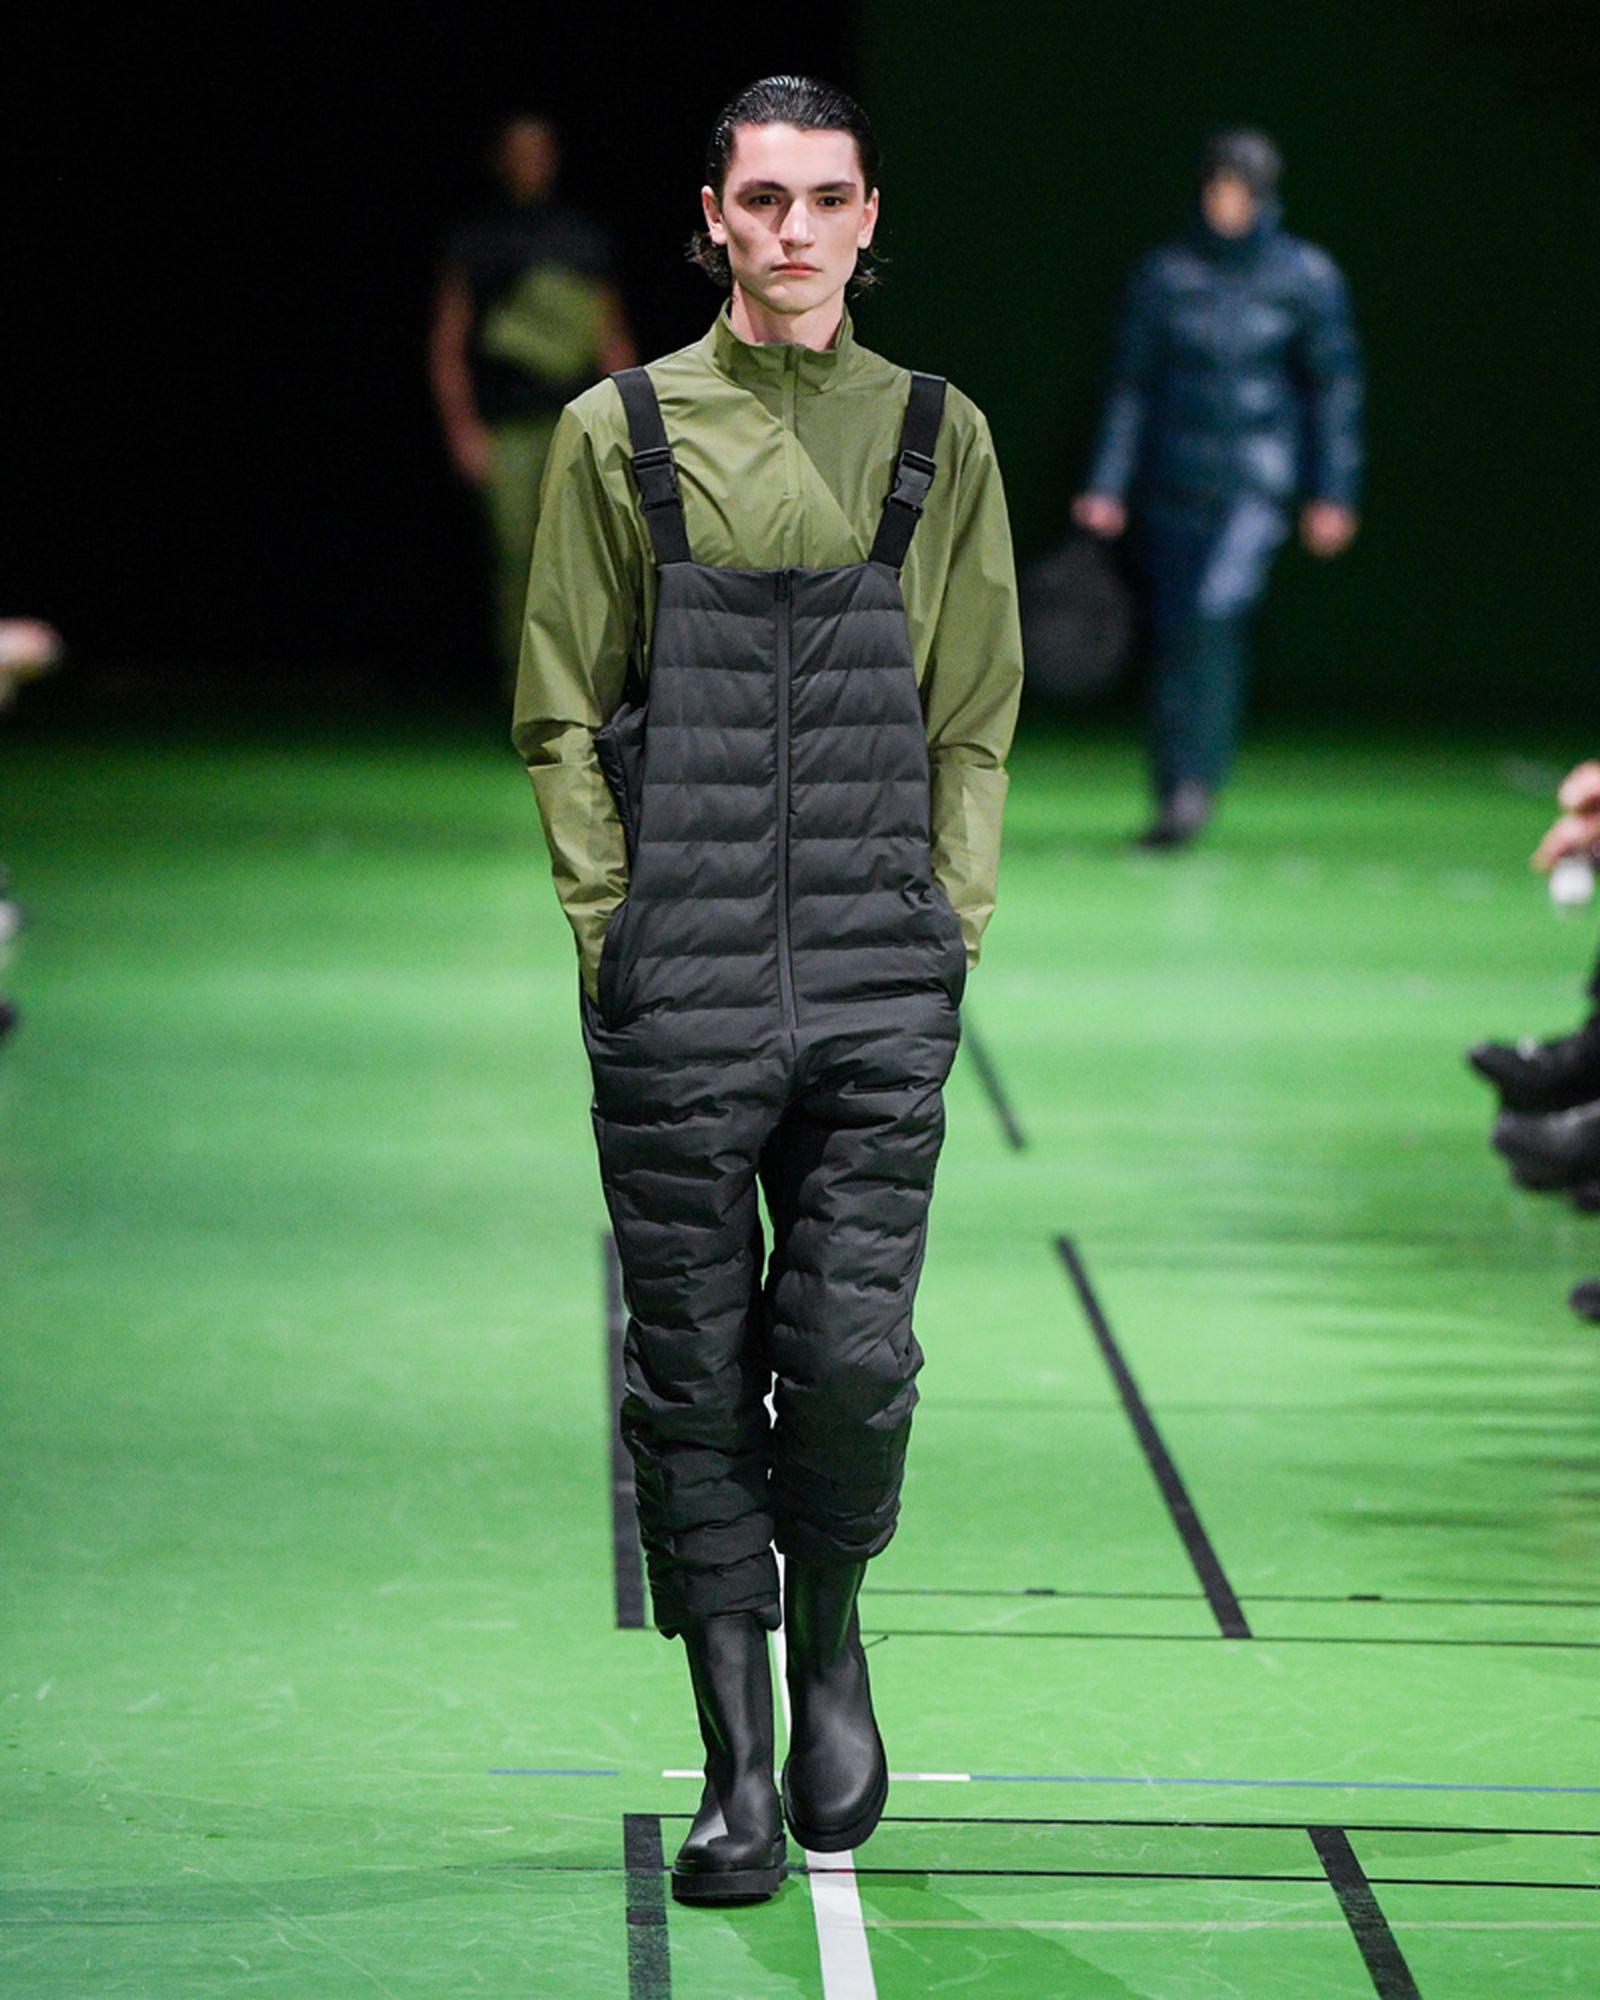 future-fashion-week-copenhagen-rains-7